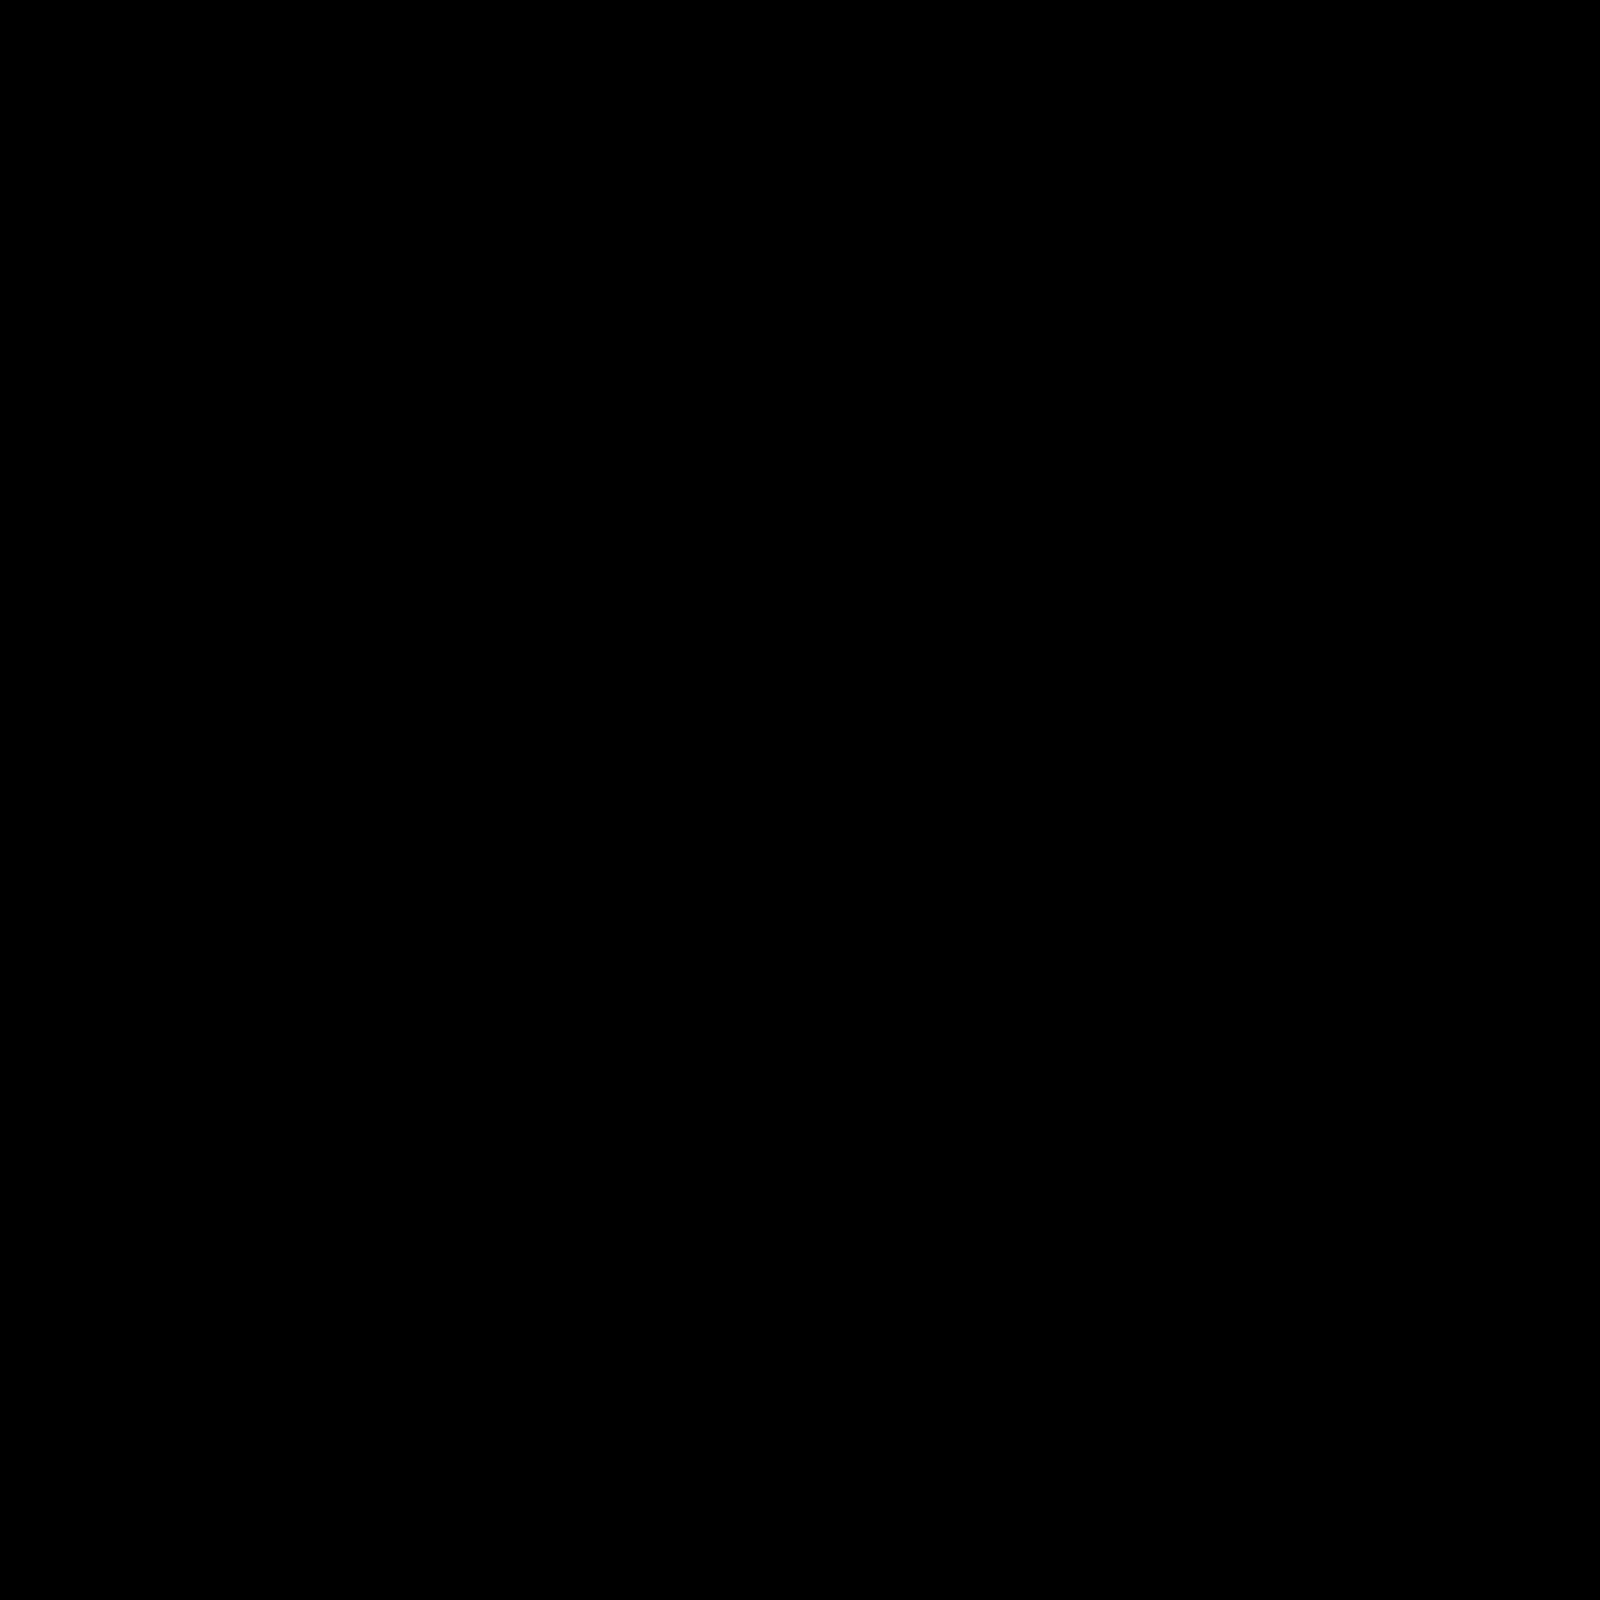 Windows Defragmenter icon